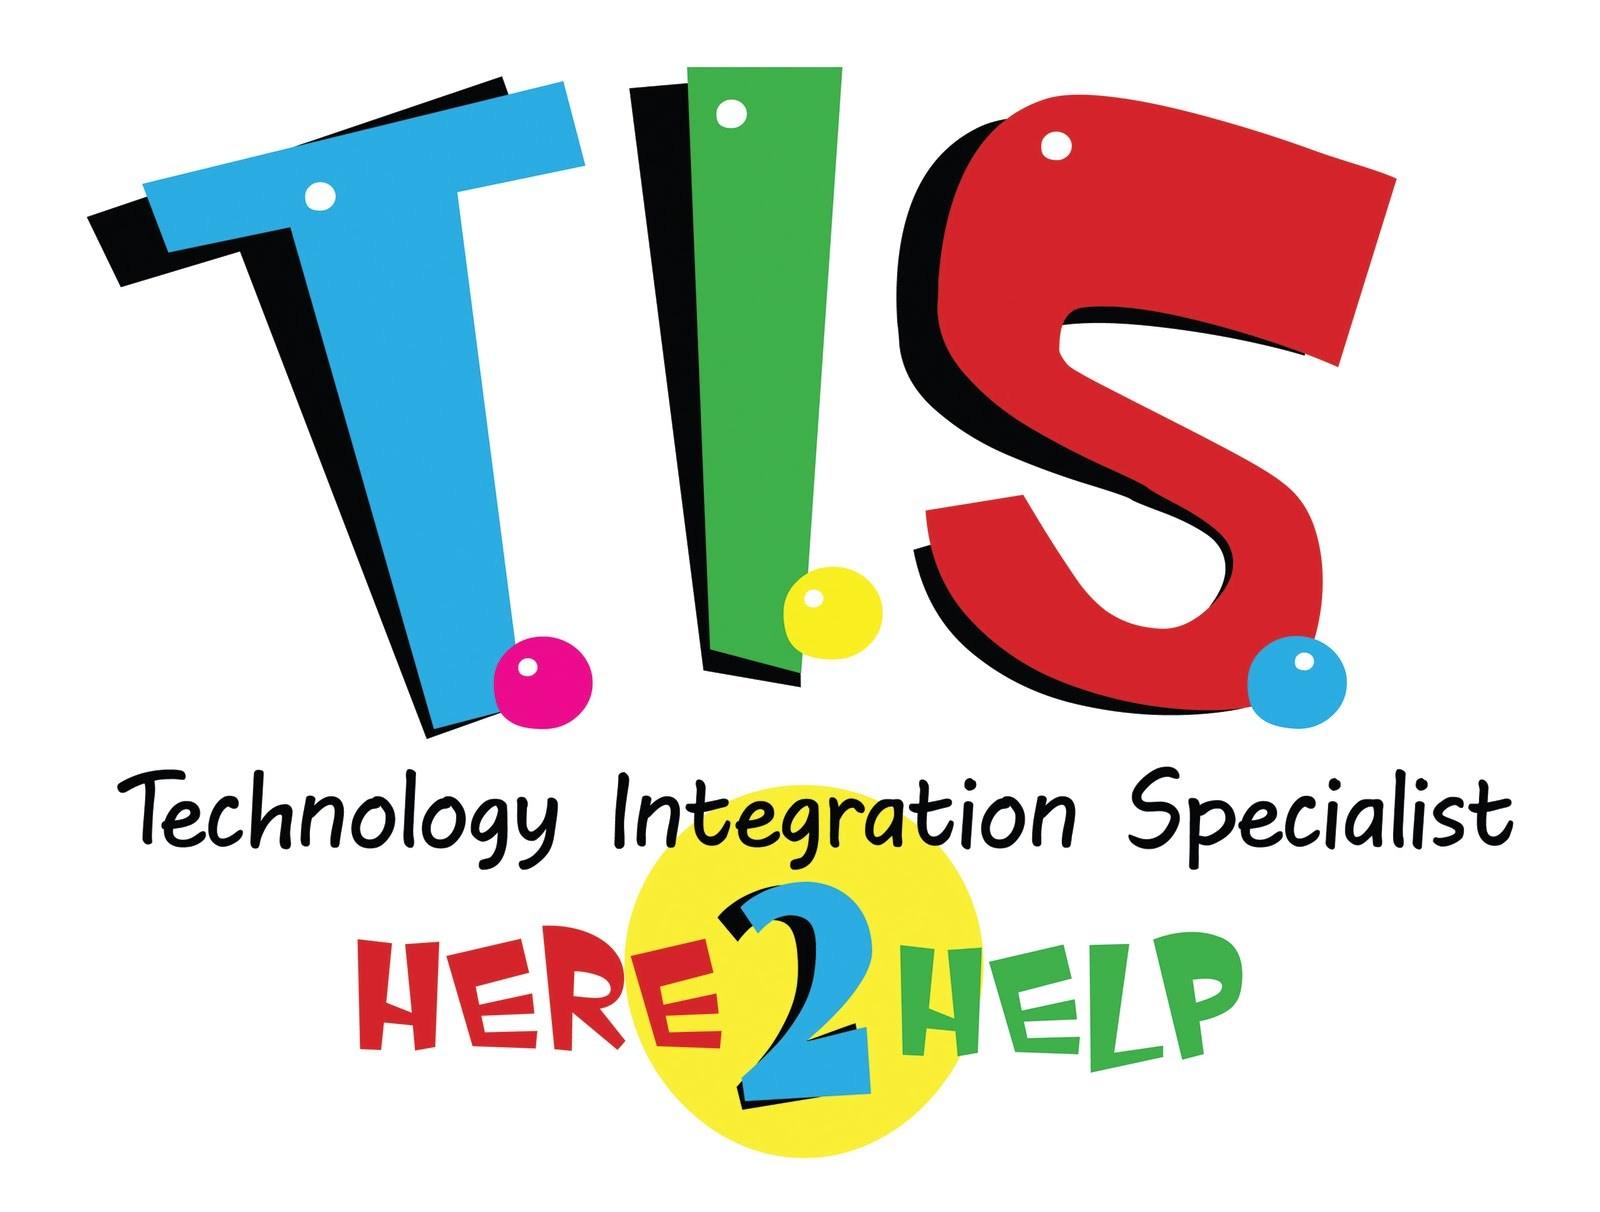 Techonoly Integration Specialist